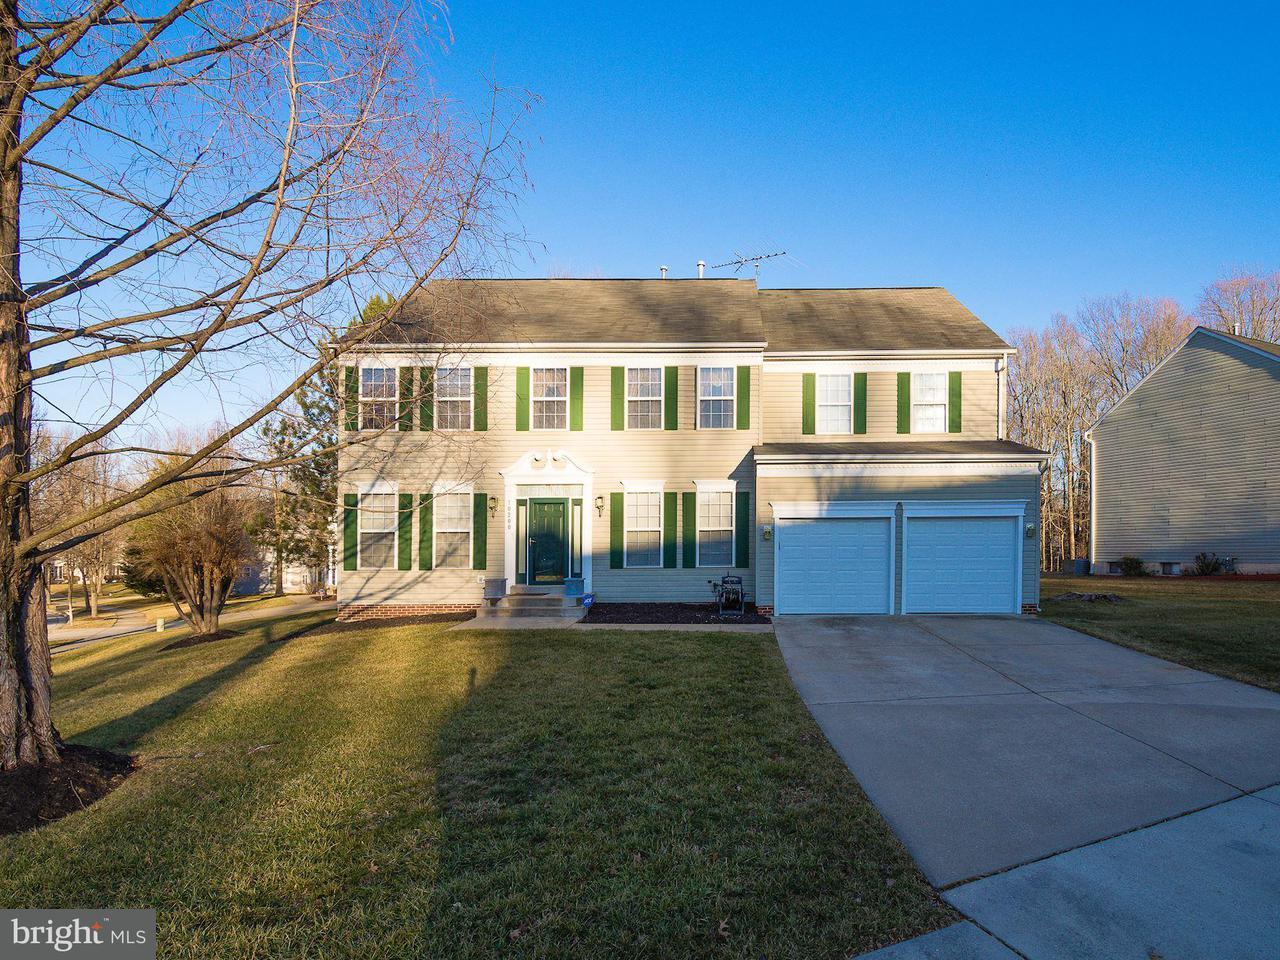 Single Family Home for Sale at 10200 Rock Oak Ter 10200 Rock Oak Ter Cheltenham, Maryland 20623 United States